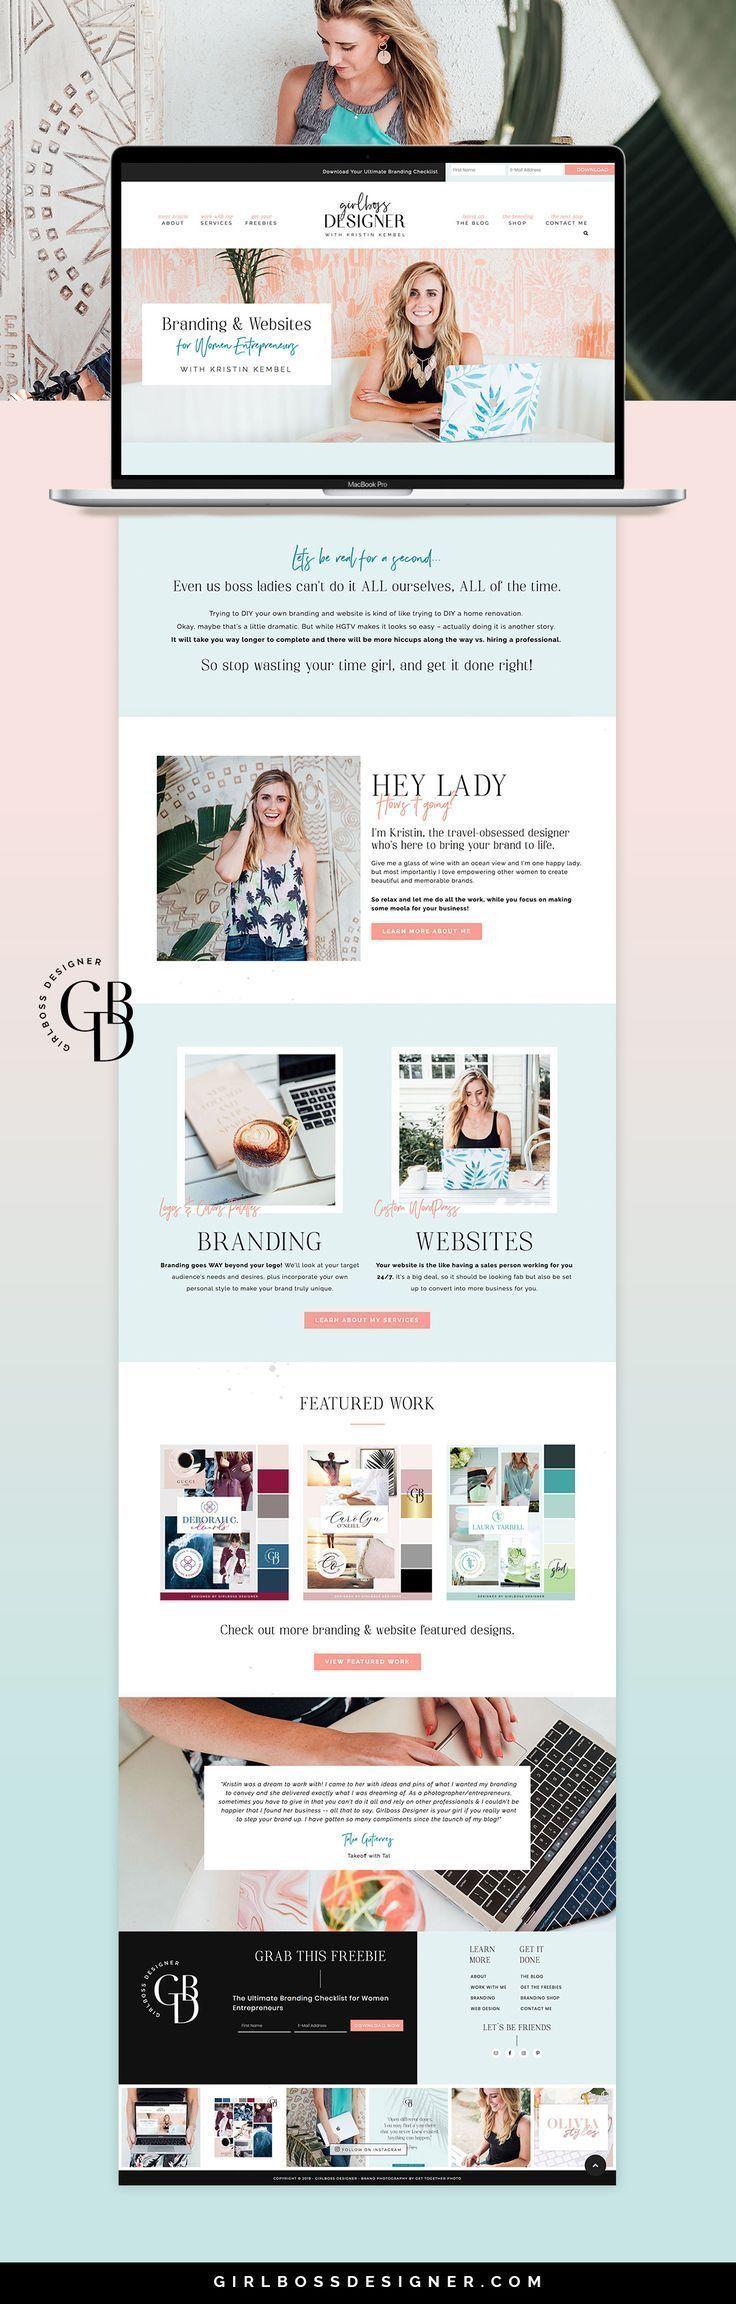 Feminine Wordpress Websites For Female Feminine Wordpress Websites For Female Entrepreneurs By Girlboss Des Web Layout Design Web Development Design Web Design